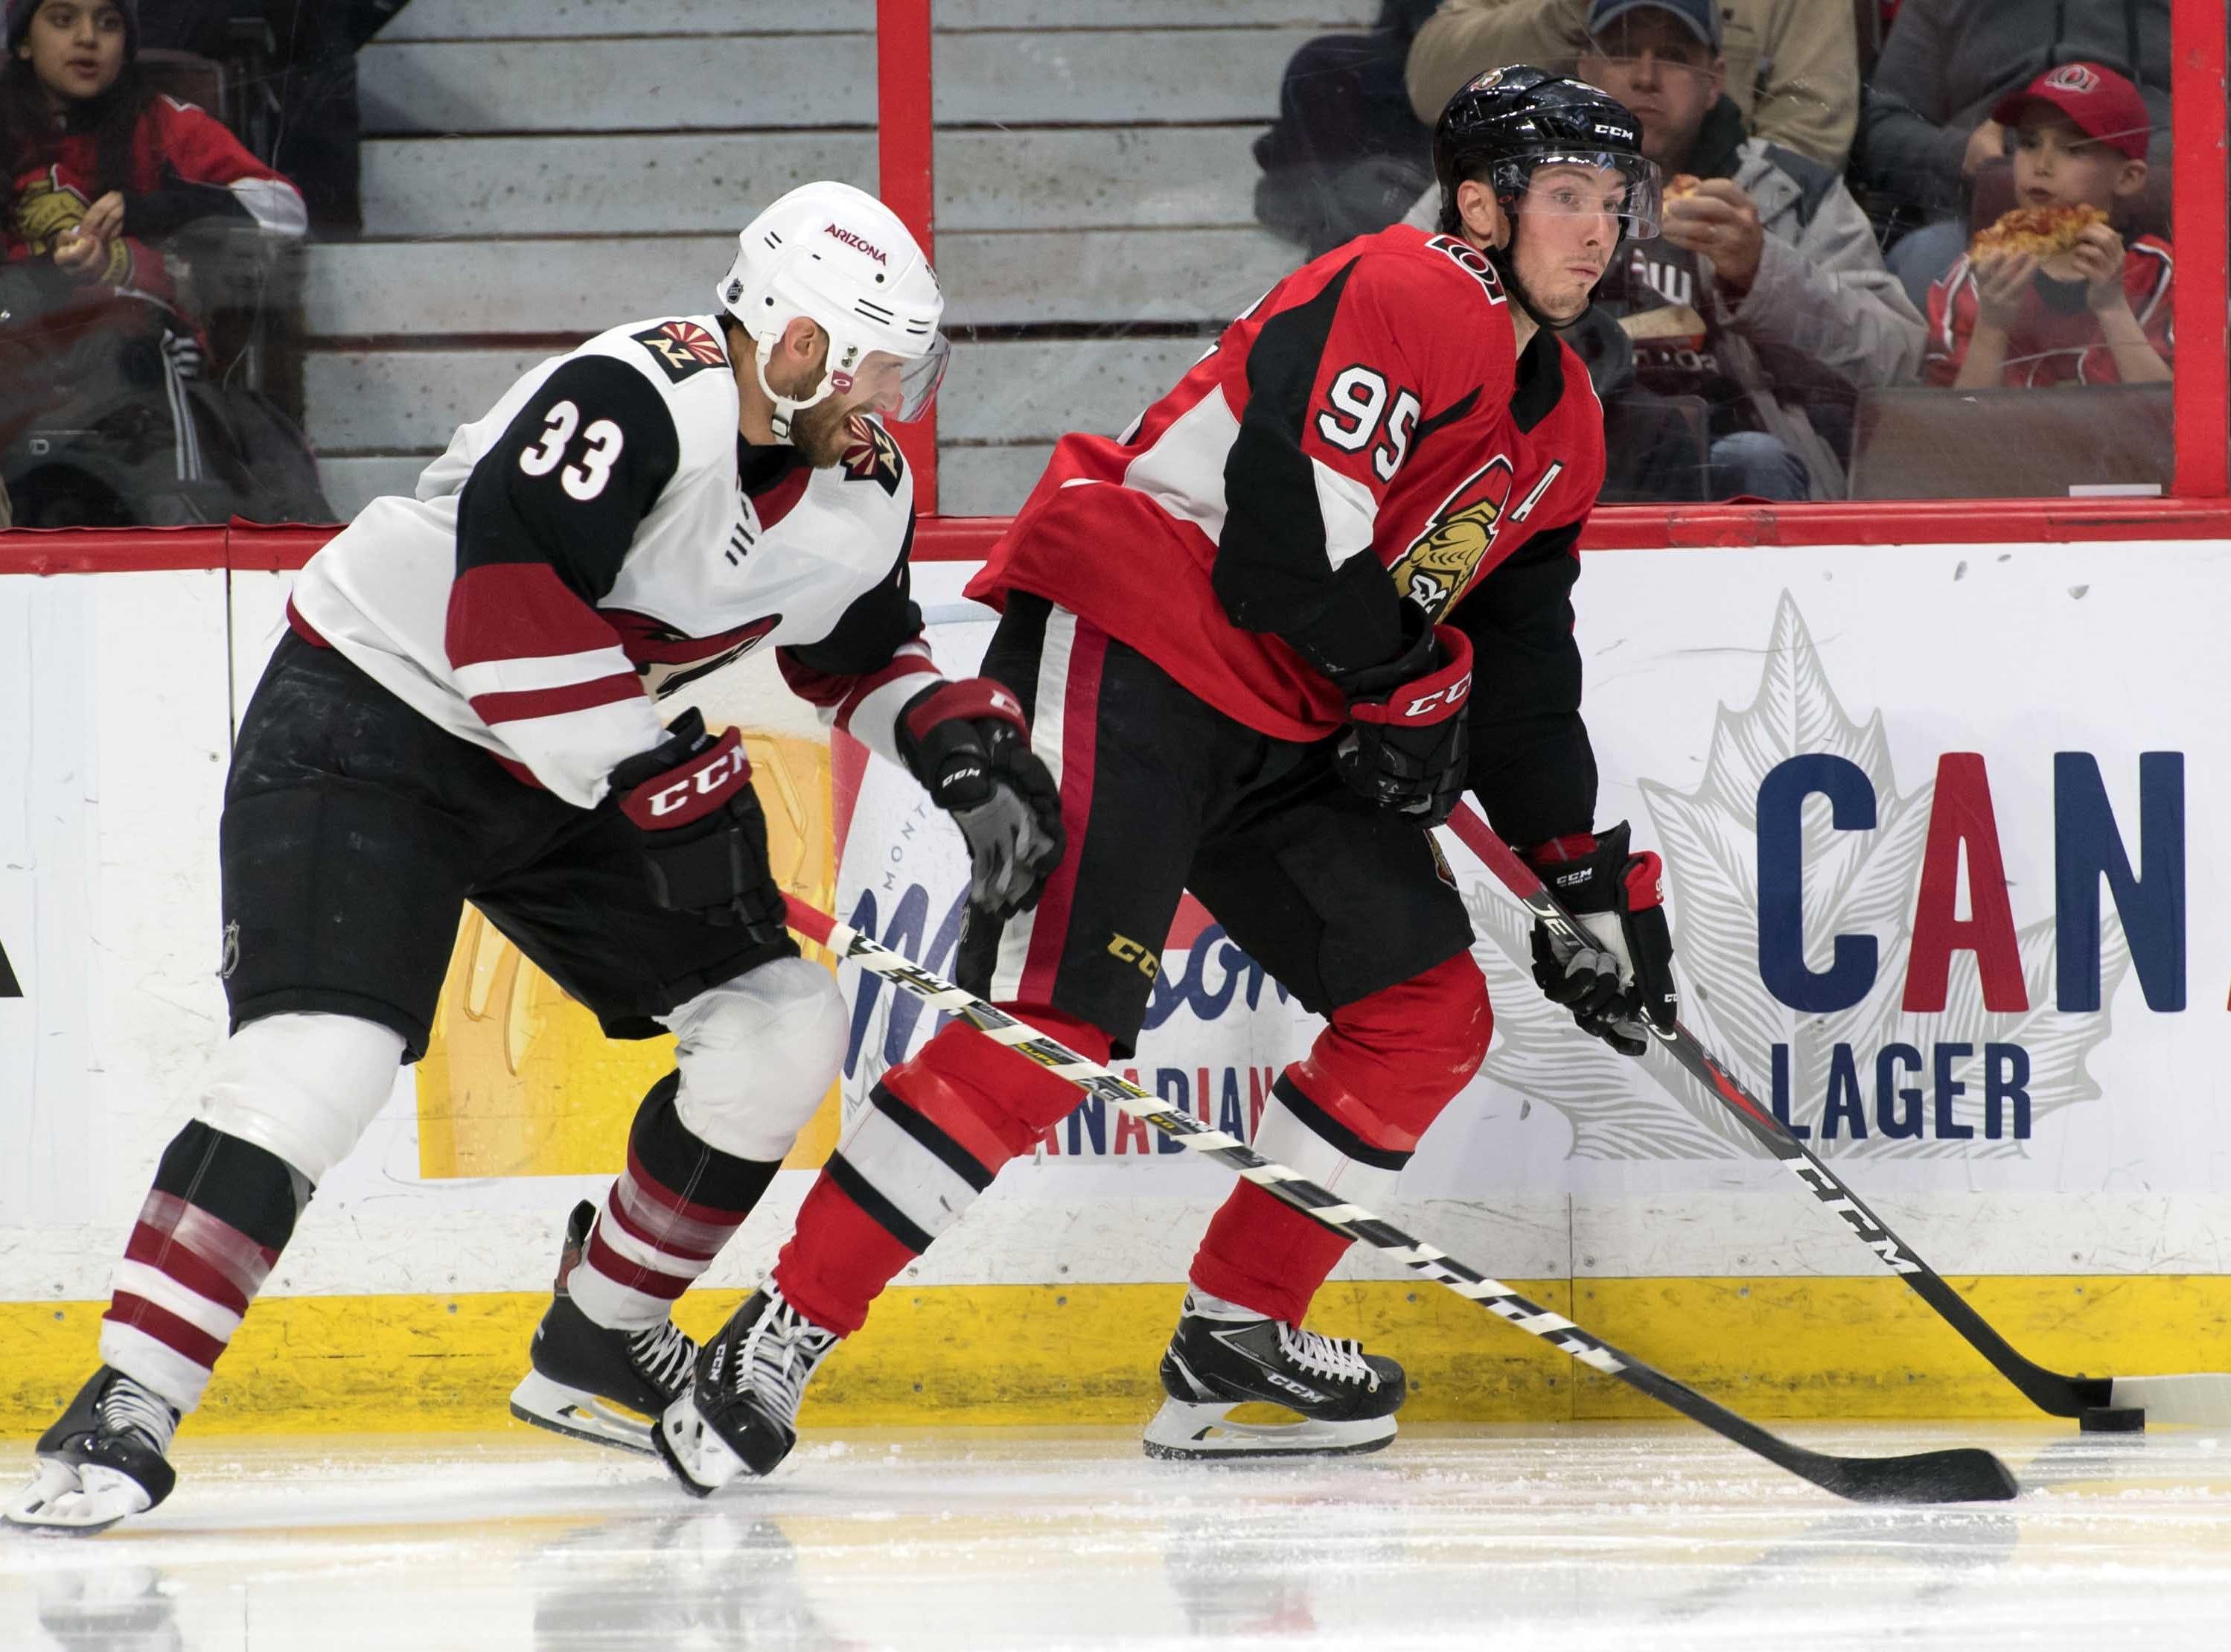 Jan 22, 2019; Ottawa, Ontario, CAN; Arizona Coyotes defenseman Alex Goligoski (33) chases Ottawa Senators [center Matt Duchene (95) in the second period at the Canadian Tire Centre. Mandatory Credit: Marc DesRosiers-USA TODAY Sports